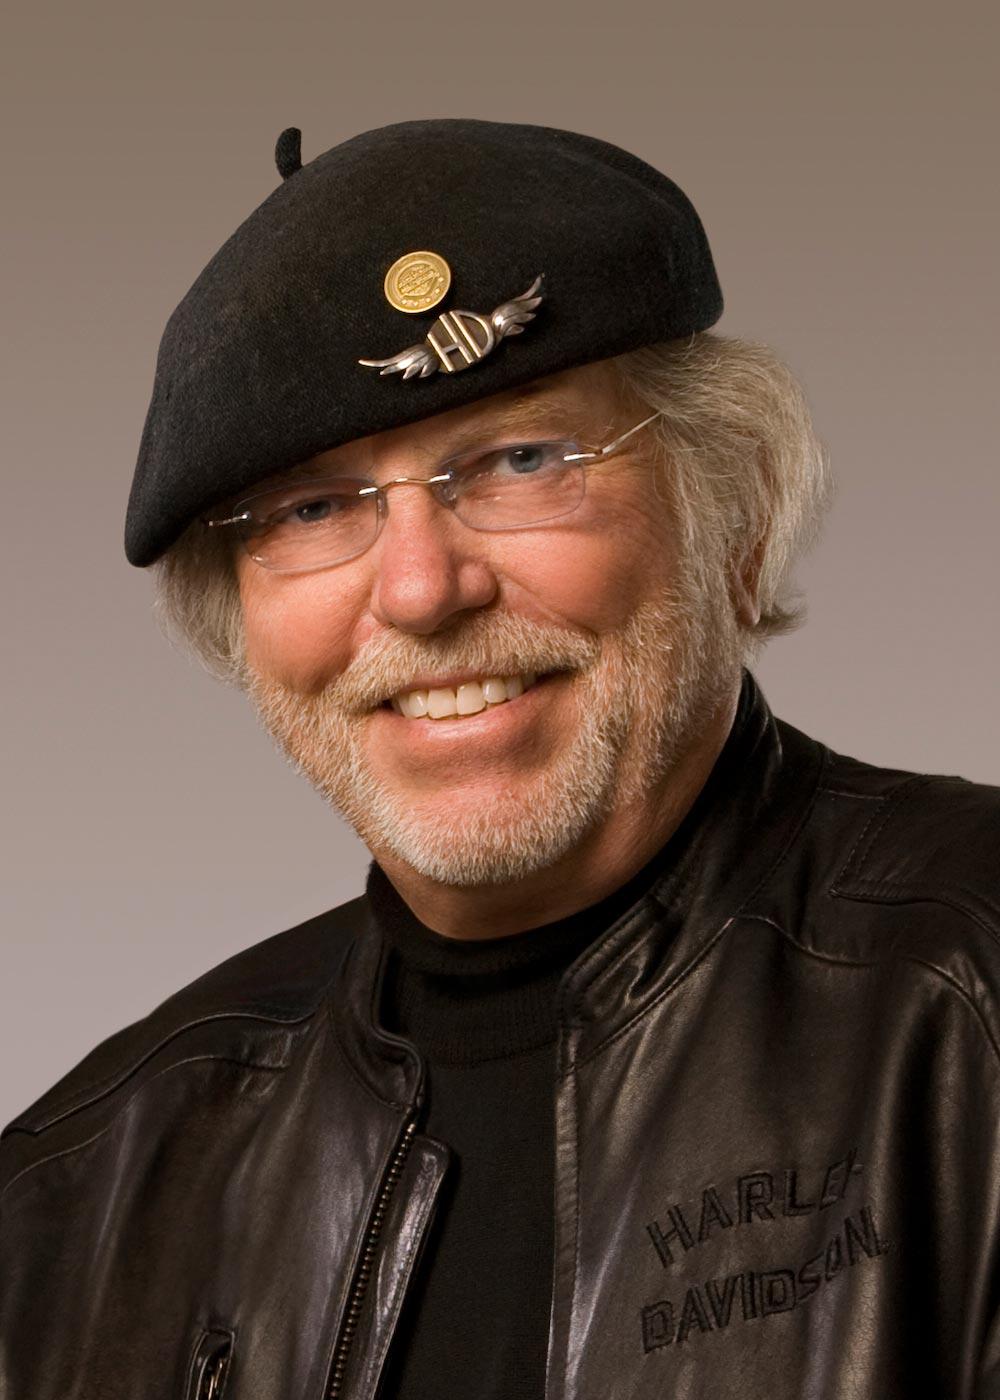 Willie-G-Davidson-Harley-Davidson